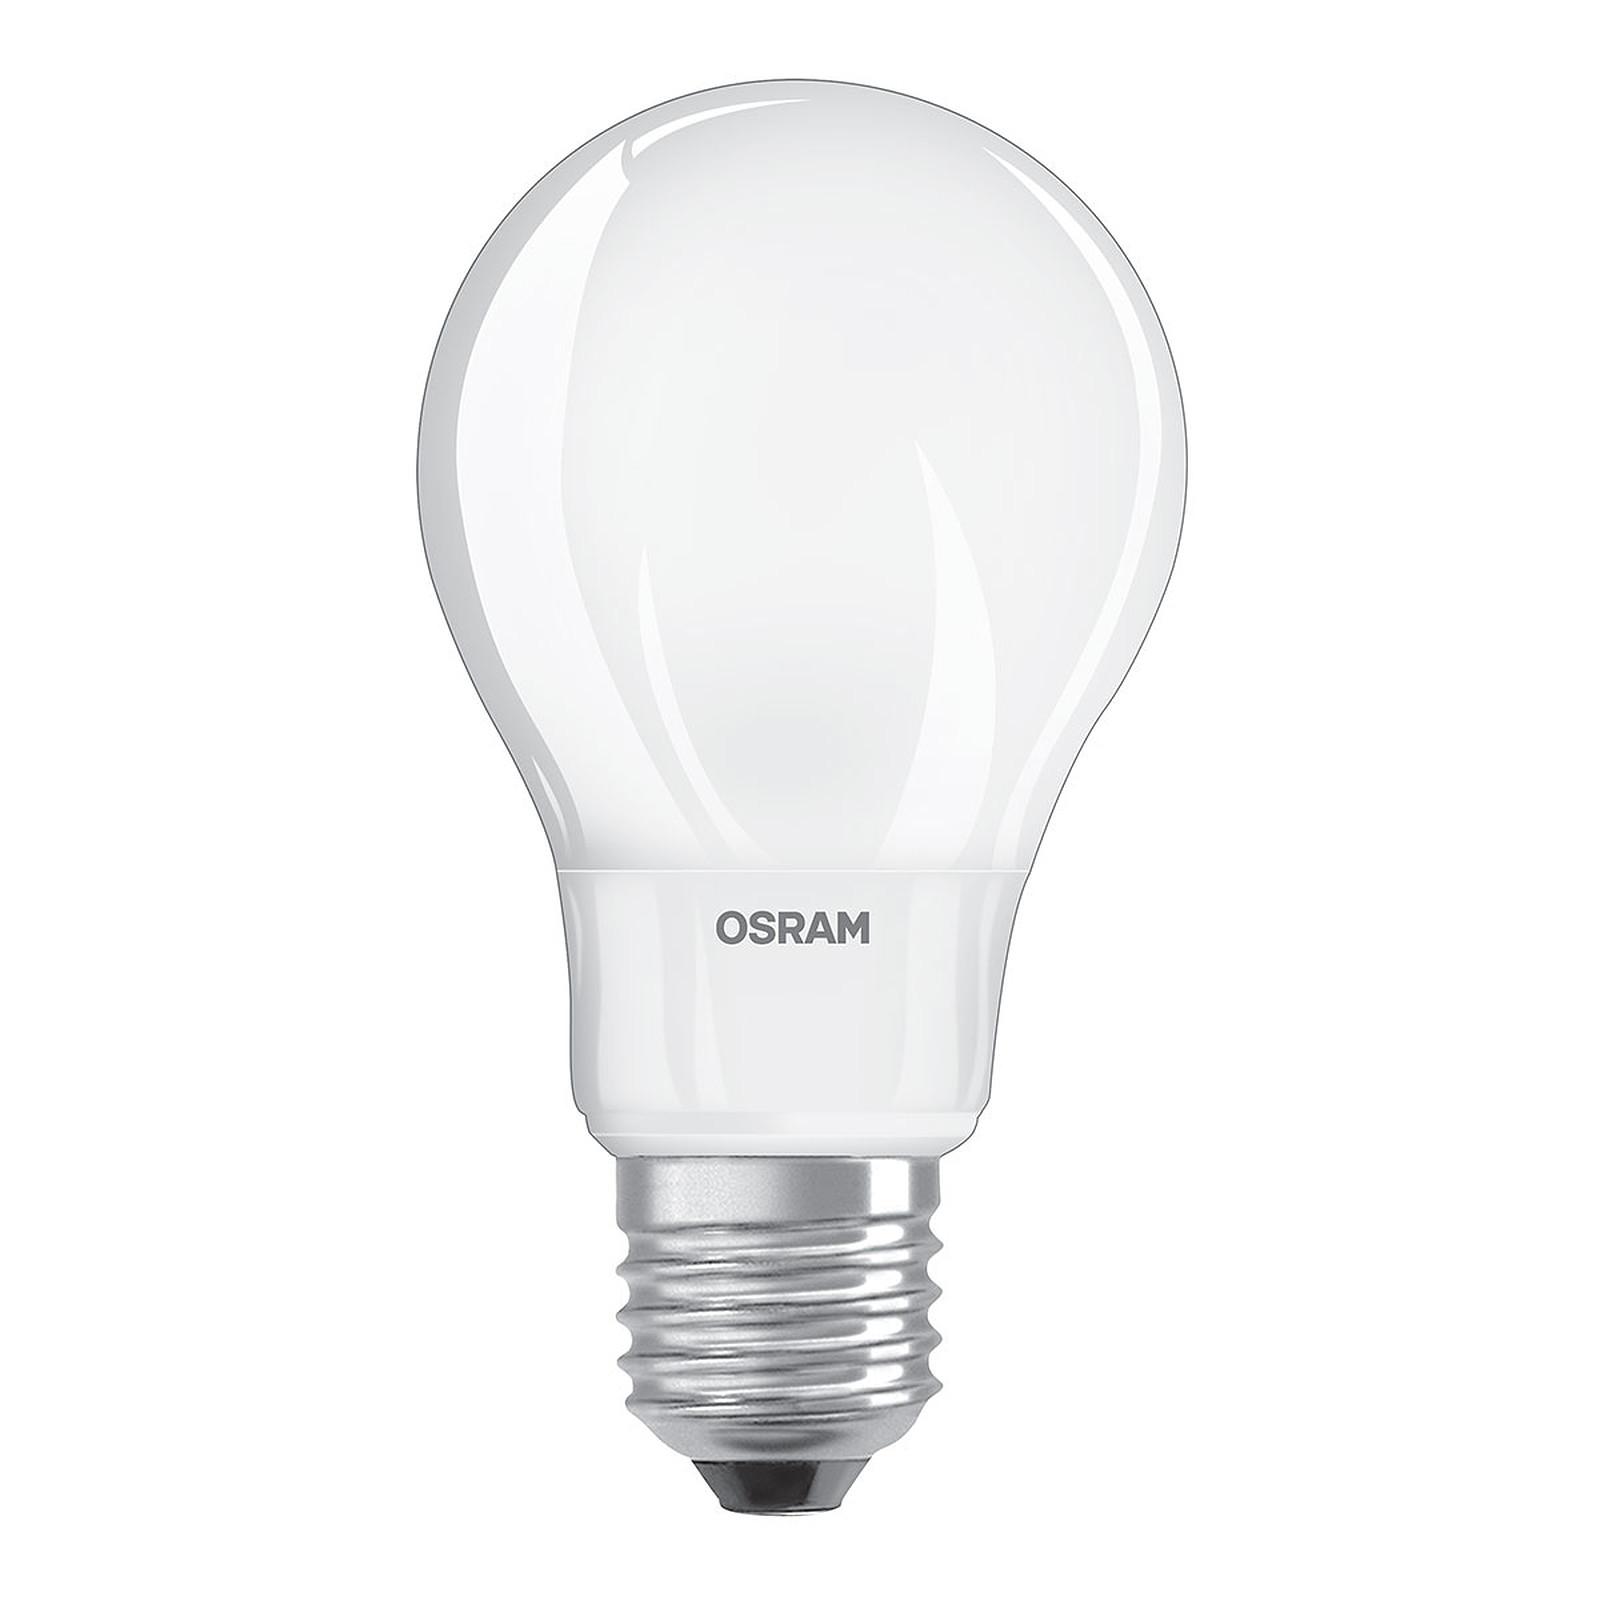 OSRAM Ampoule LED Retrofit standard E27 6W (40W) A+